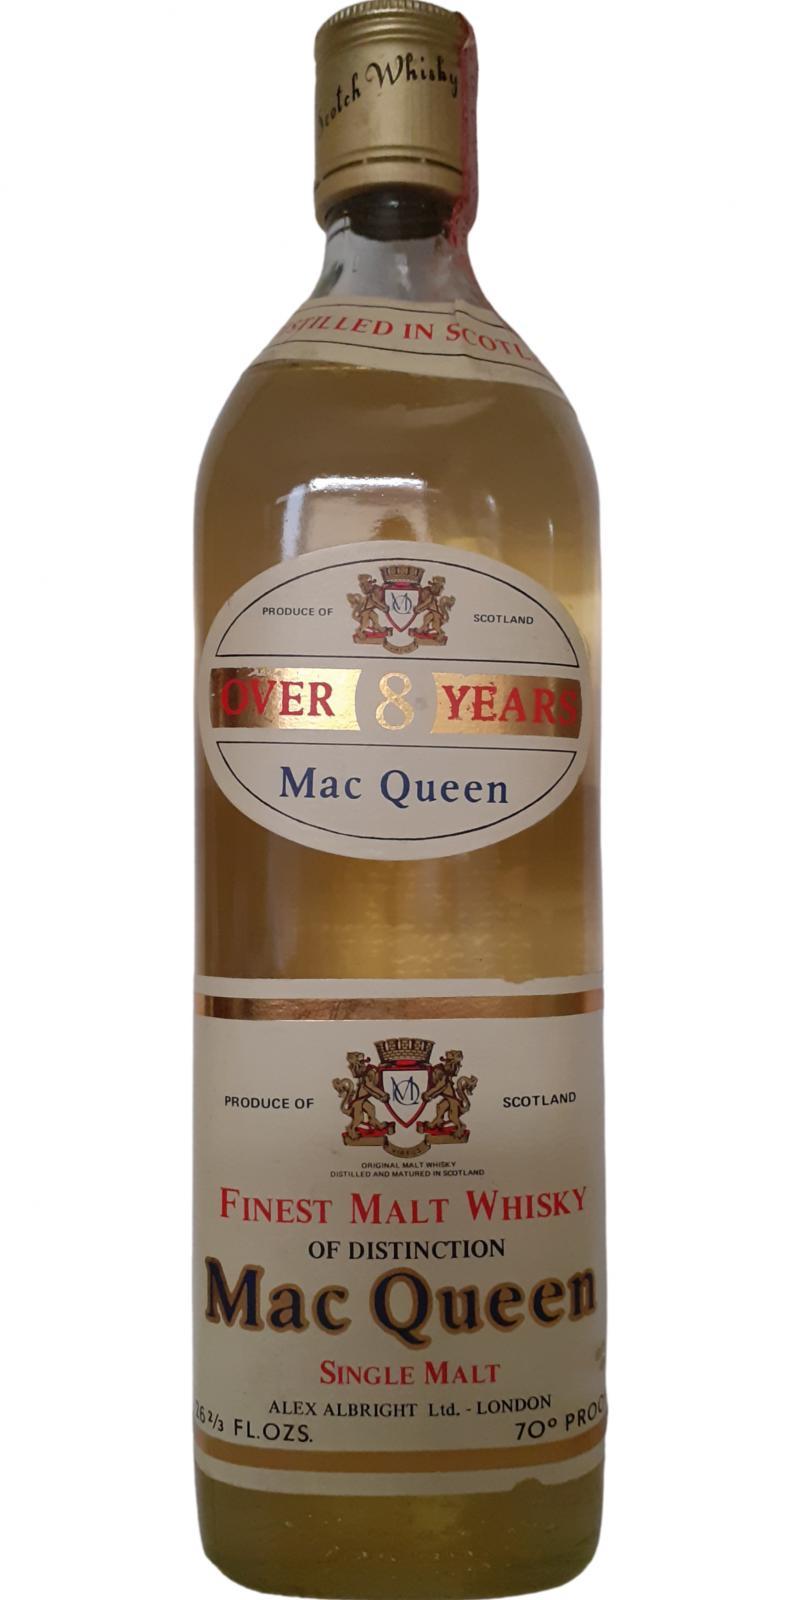 Mac Queen 08-year-old